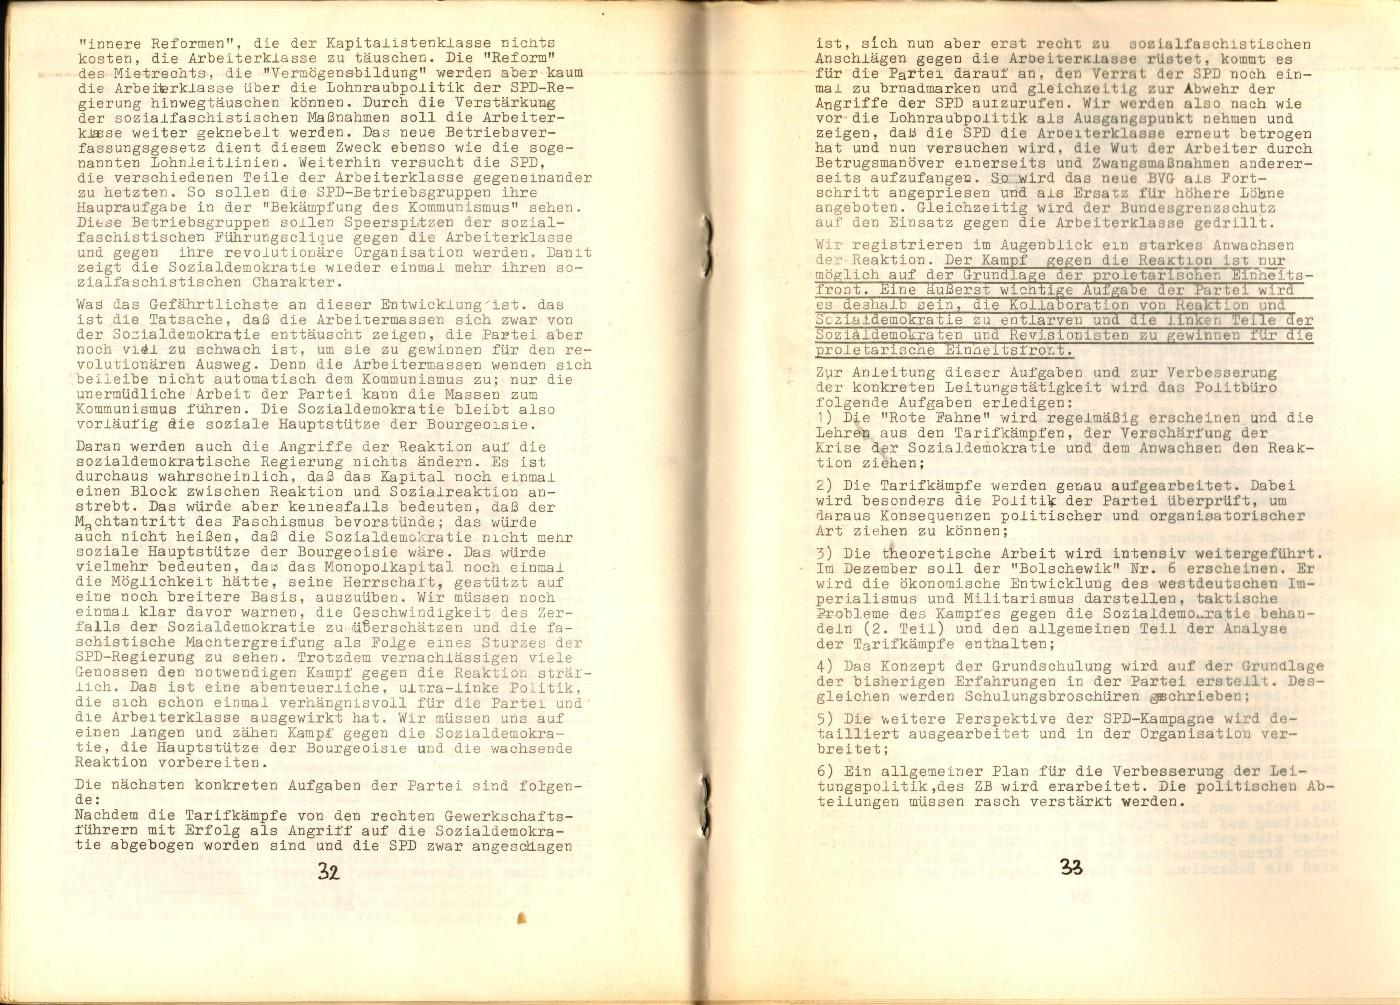 ZB_Parteiarbeiter_1970_03_21